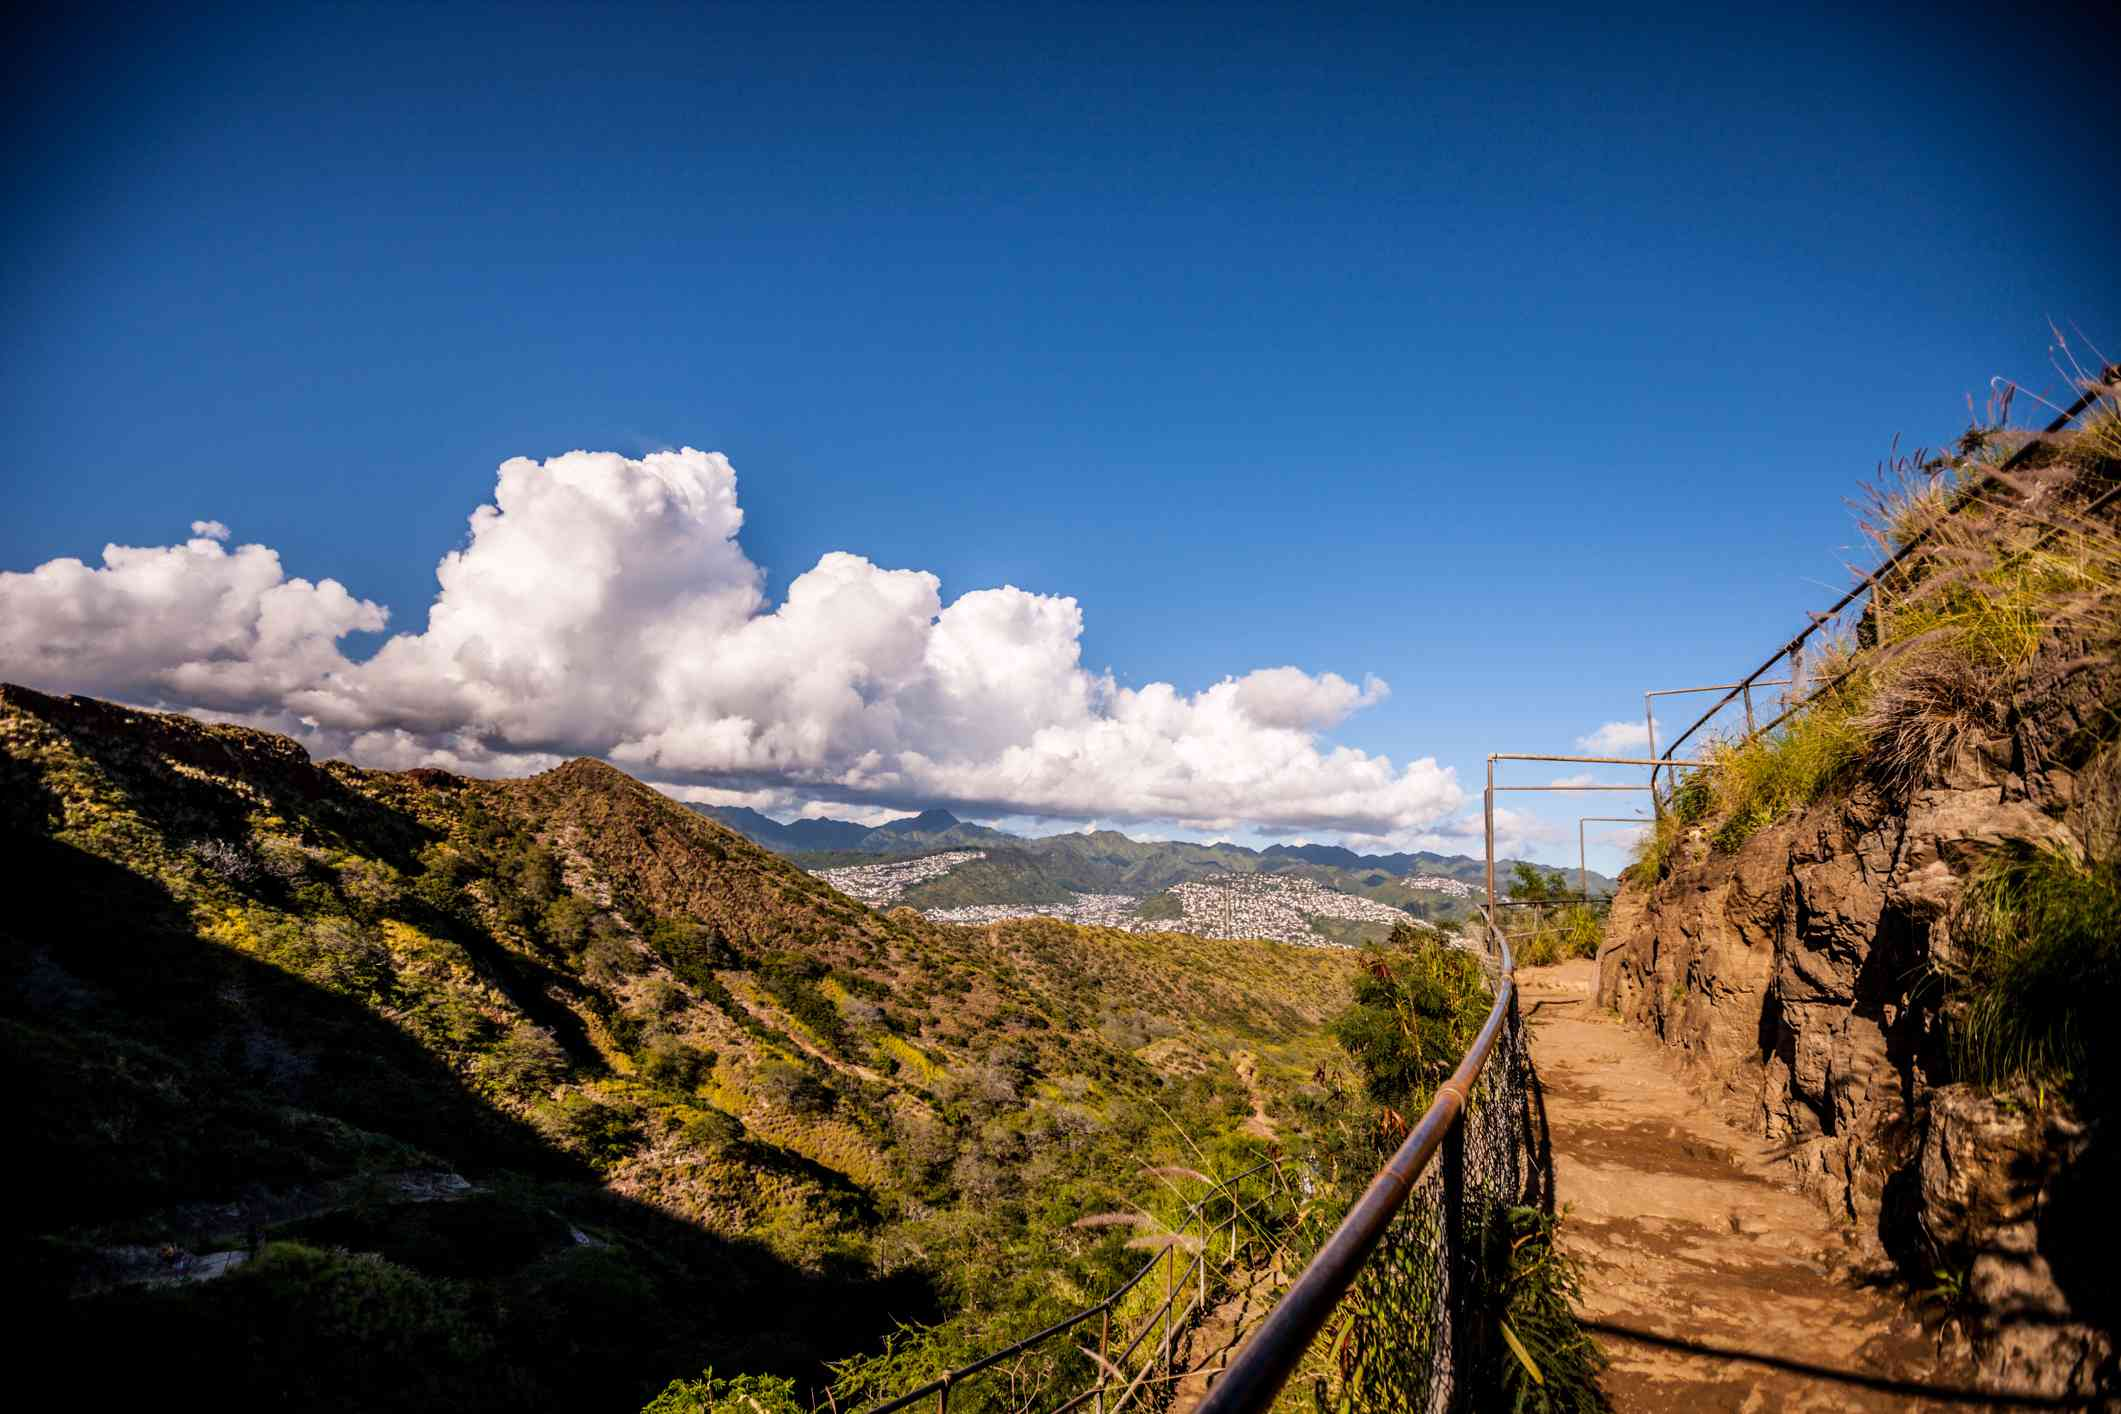 Diamond Head Trail in Honolulu, Hawaii